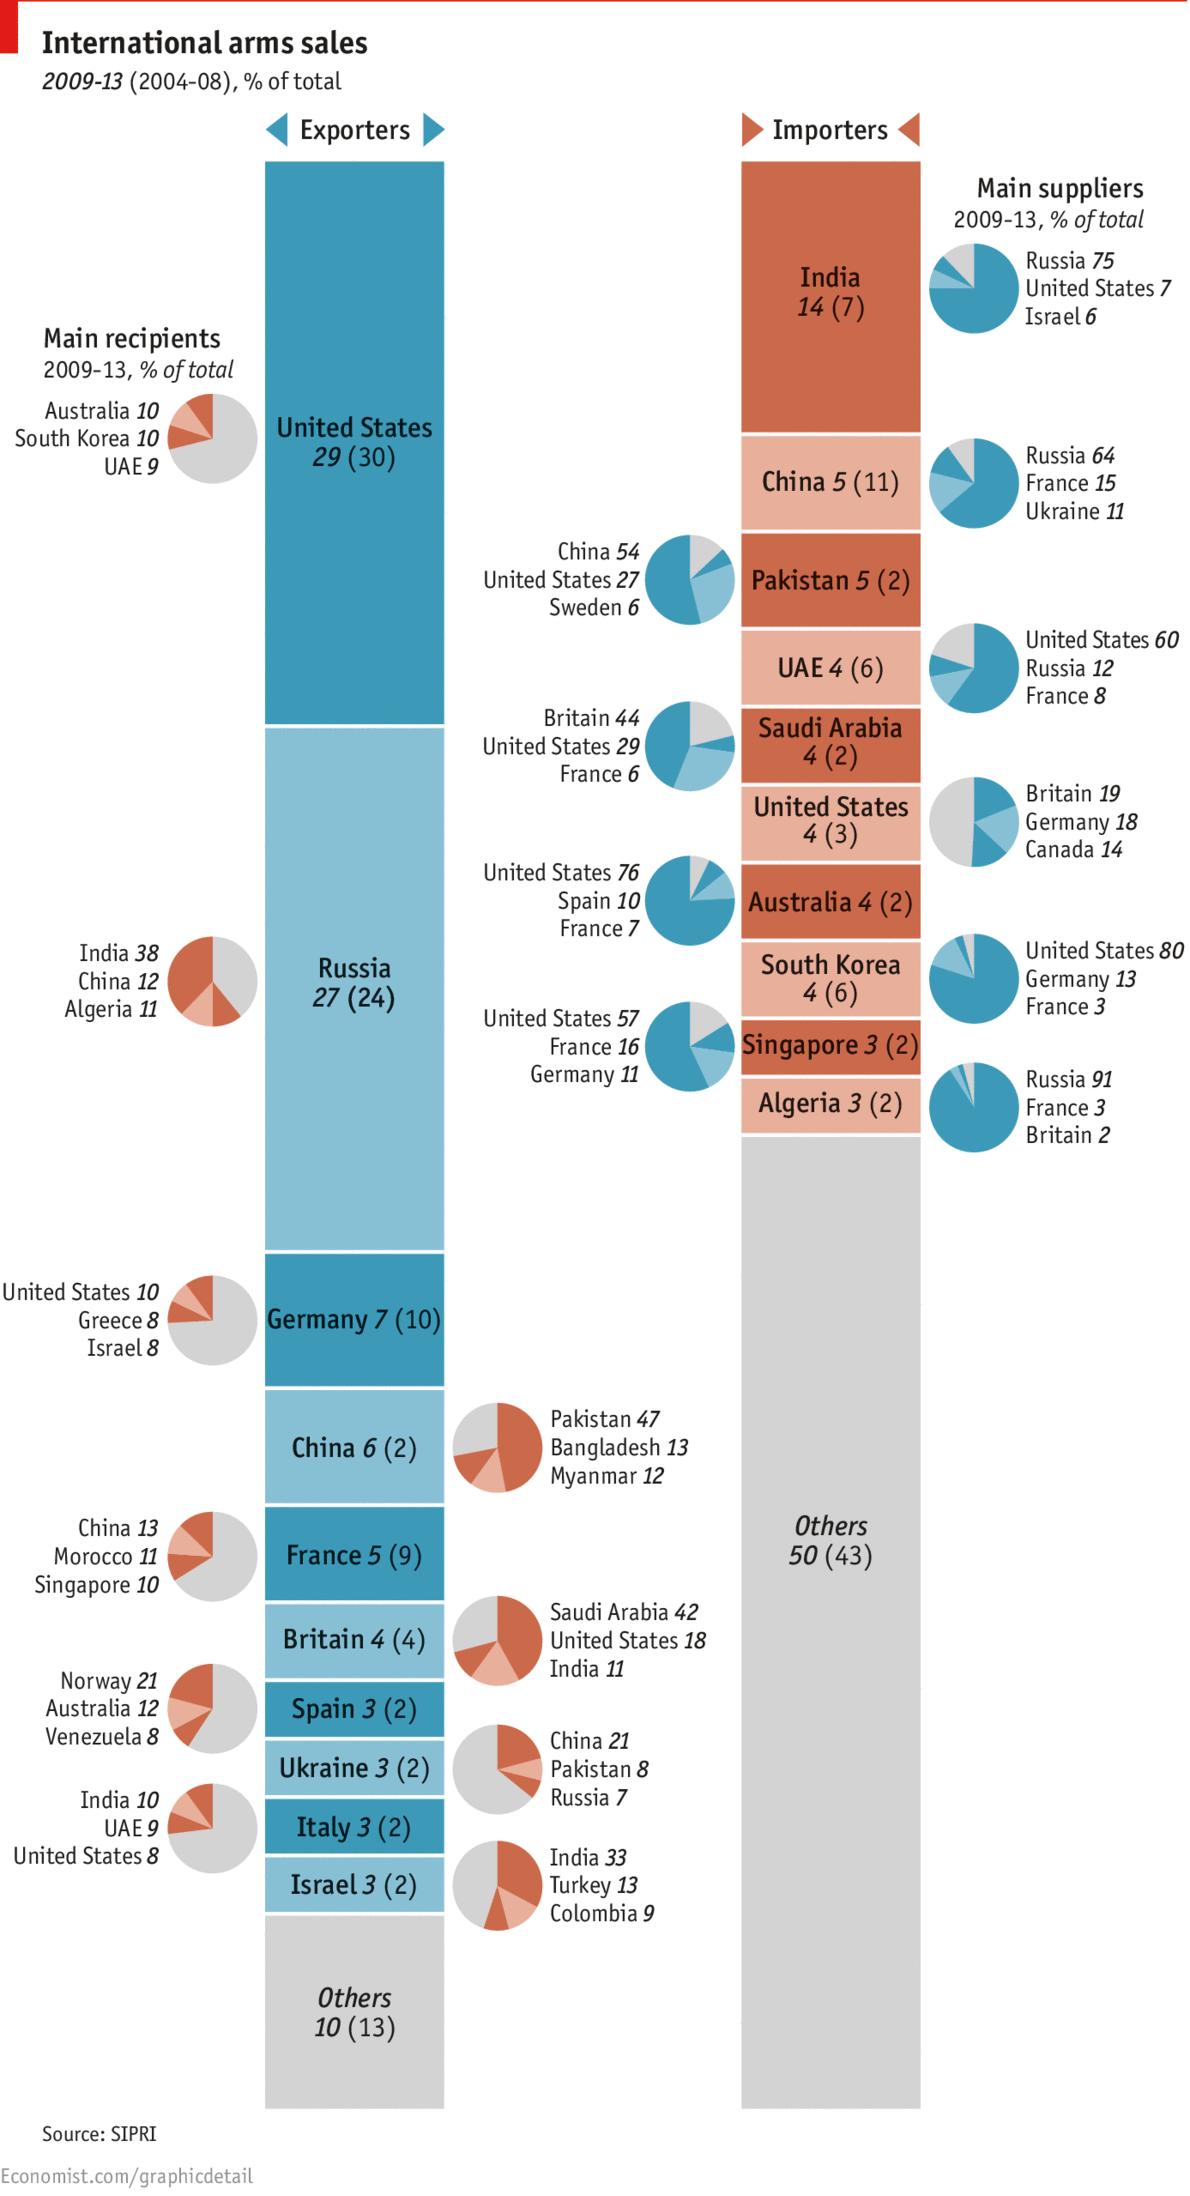 International arms trade